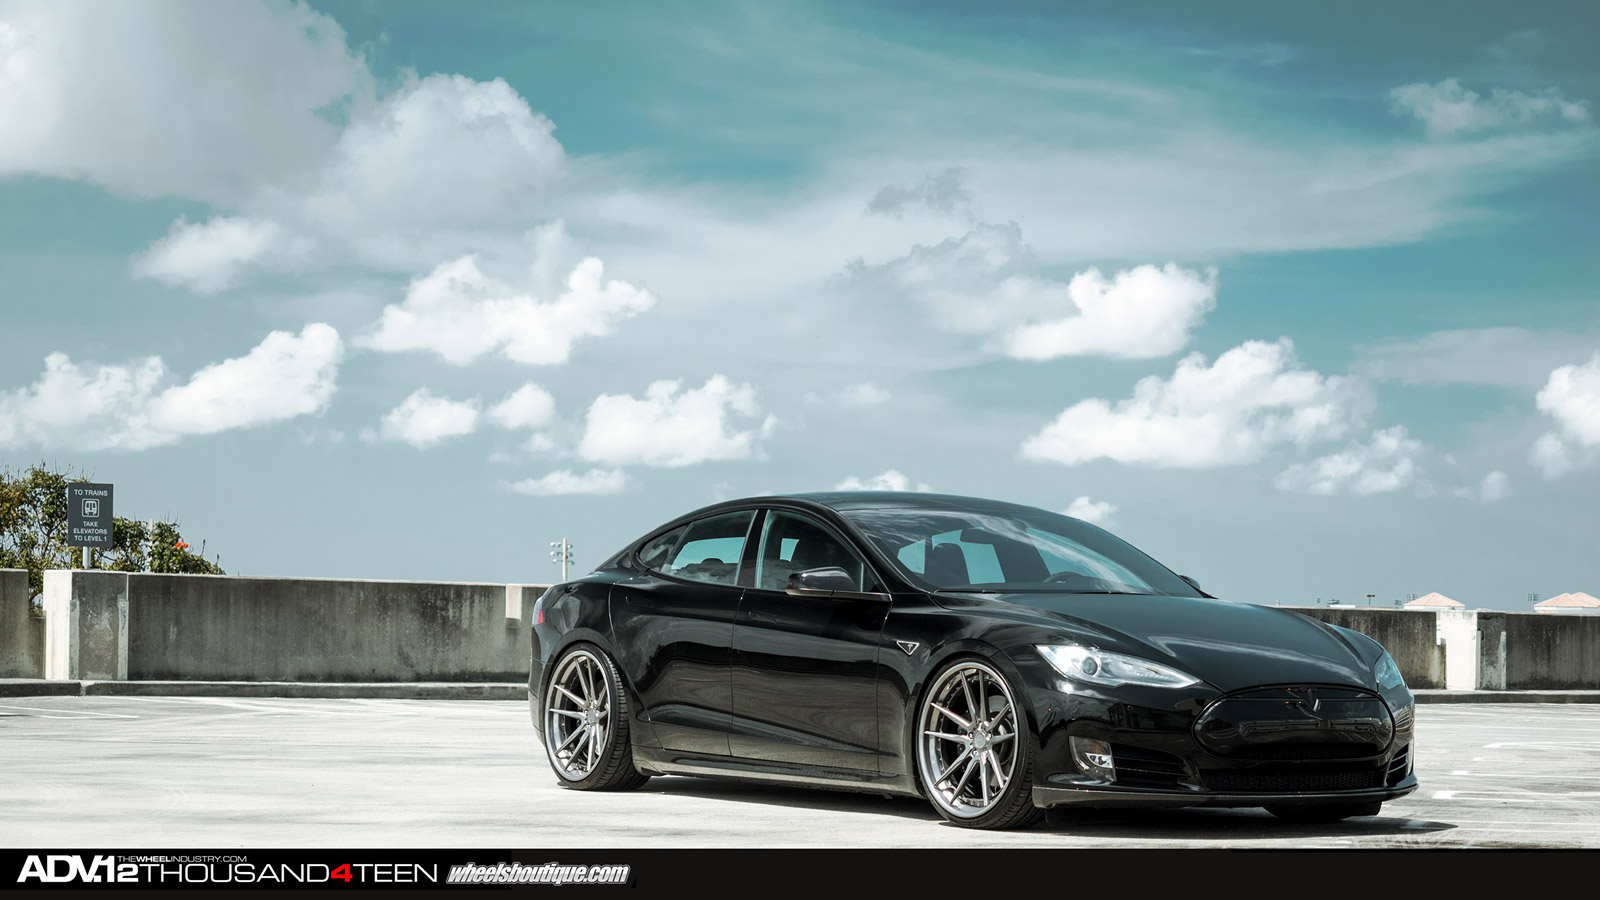 Tesla Model S Receives 22-inch ADV.1 Wheels - autoevolution